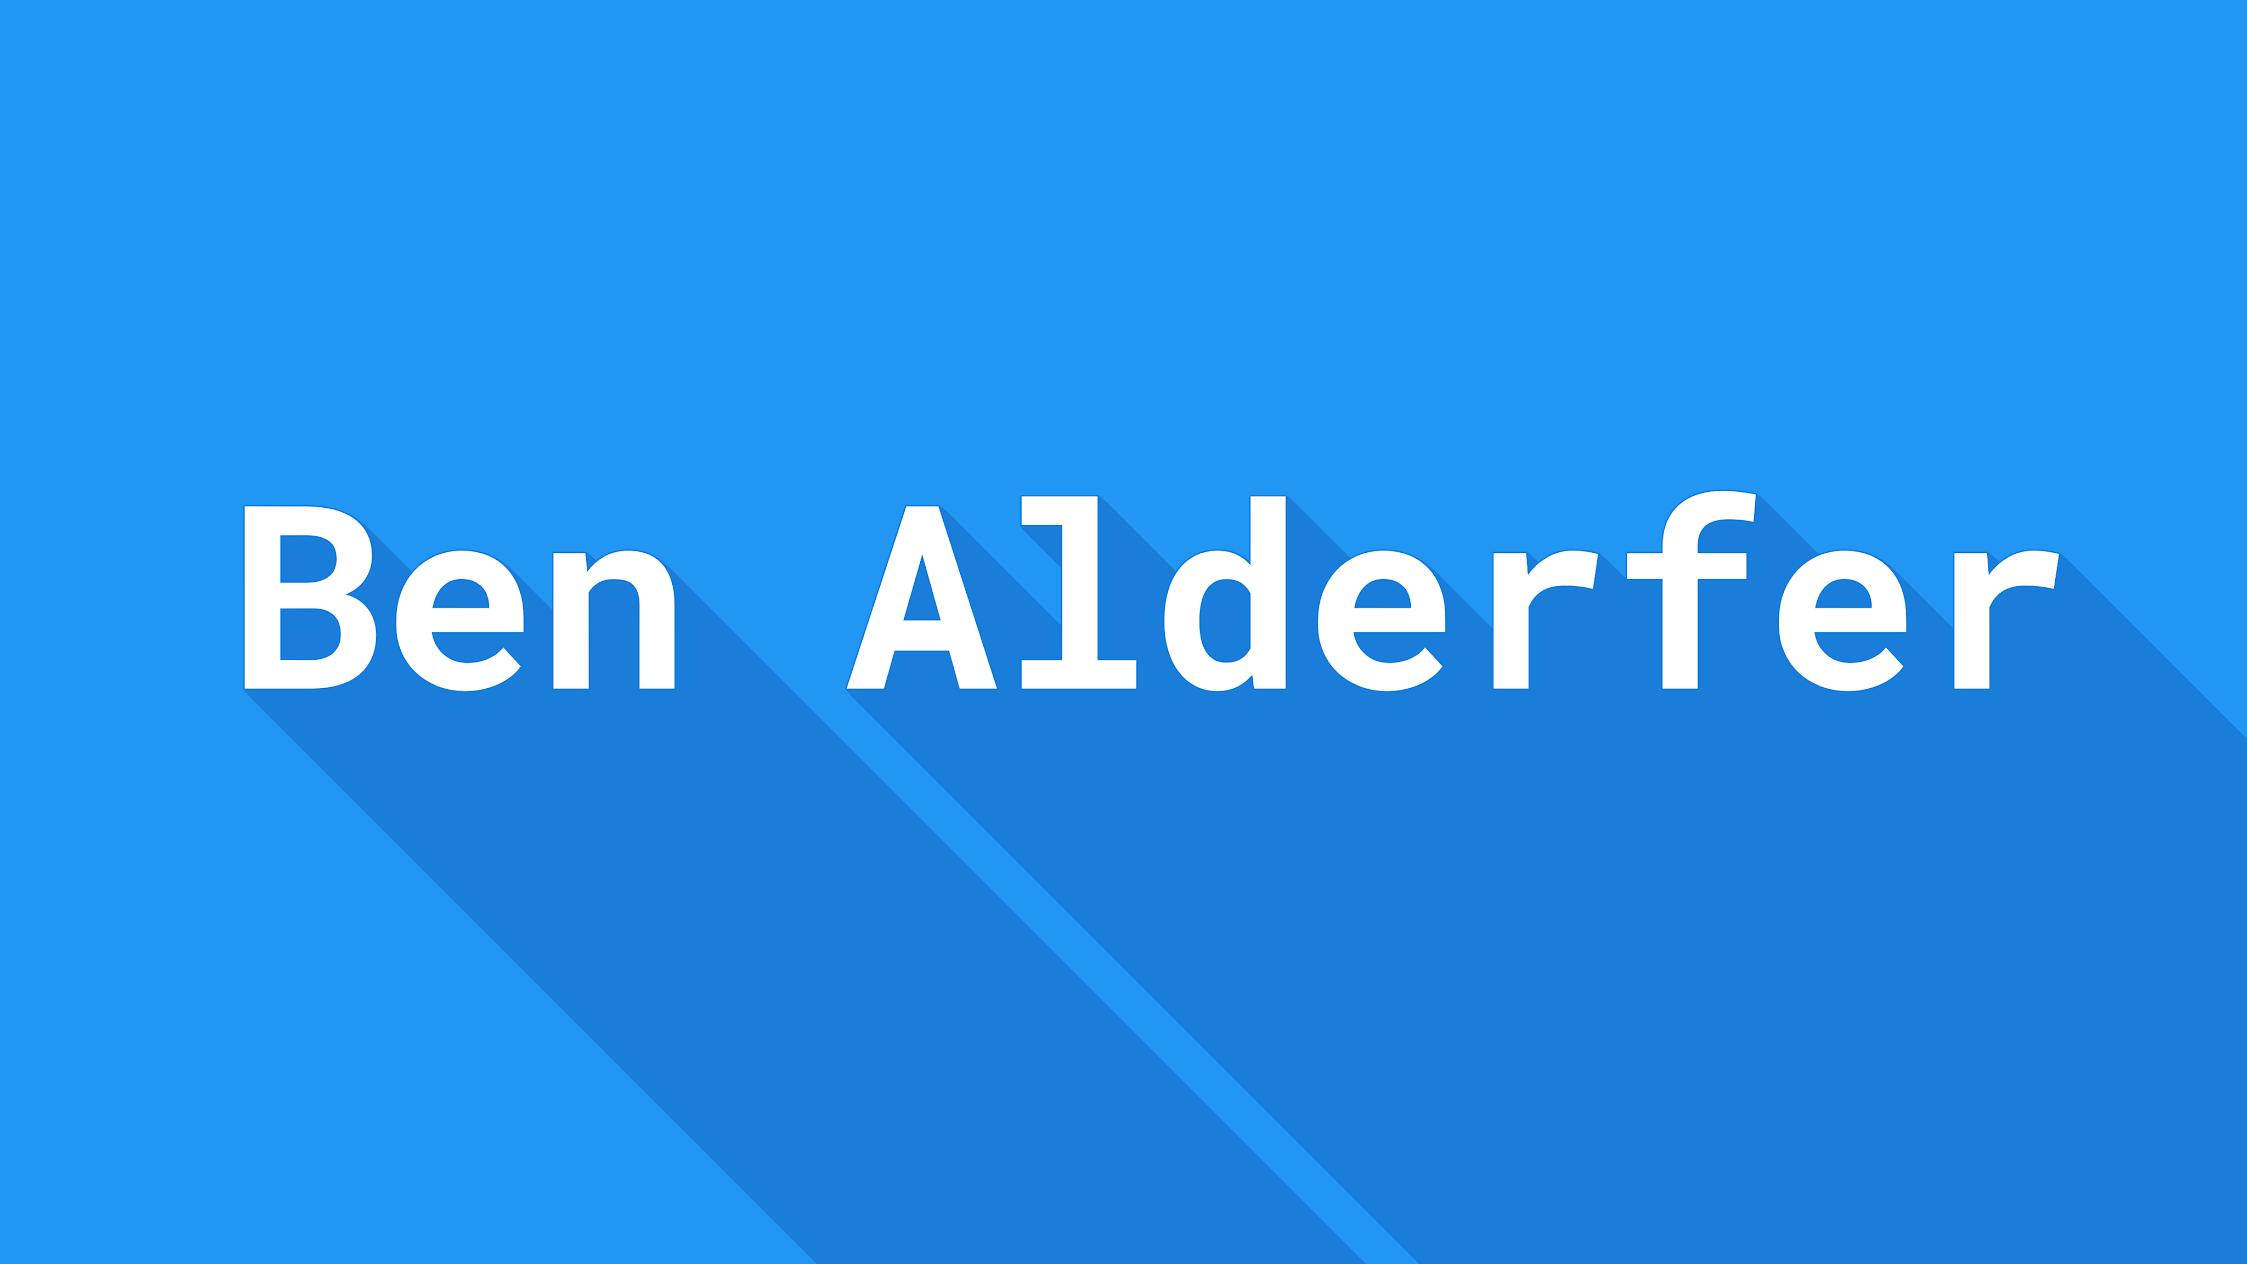 Ben Alderfer